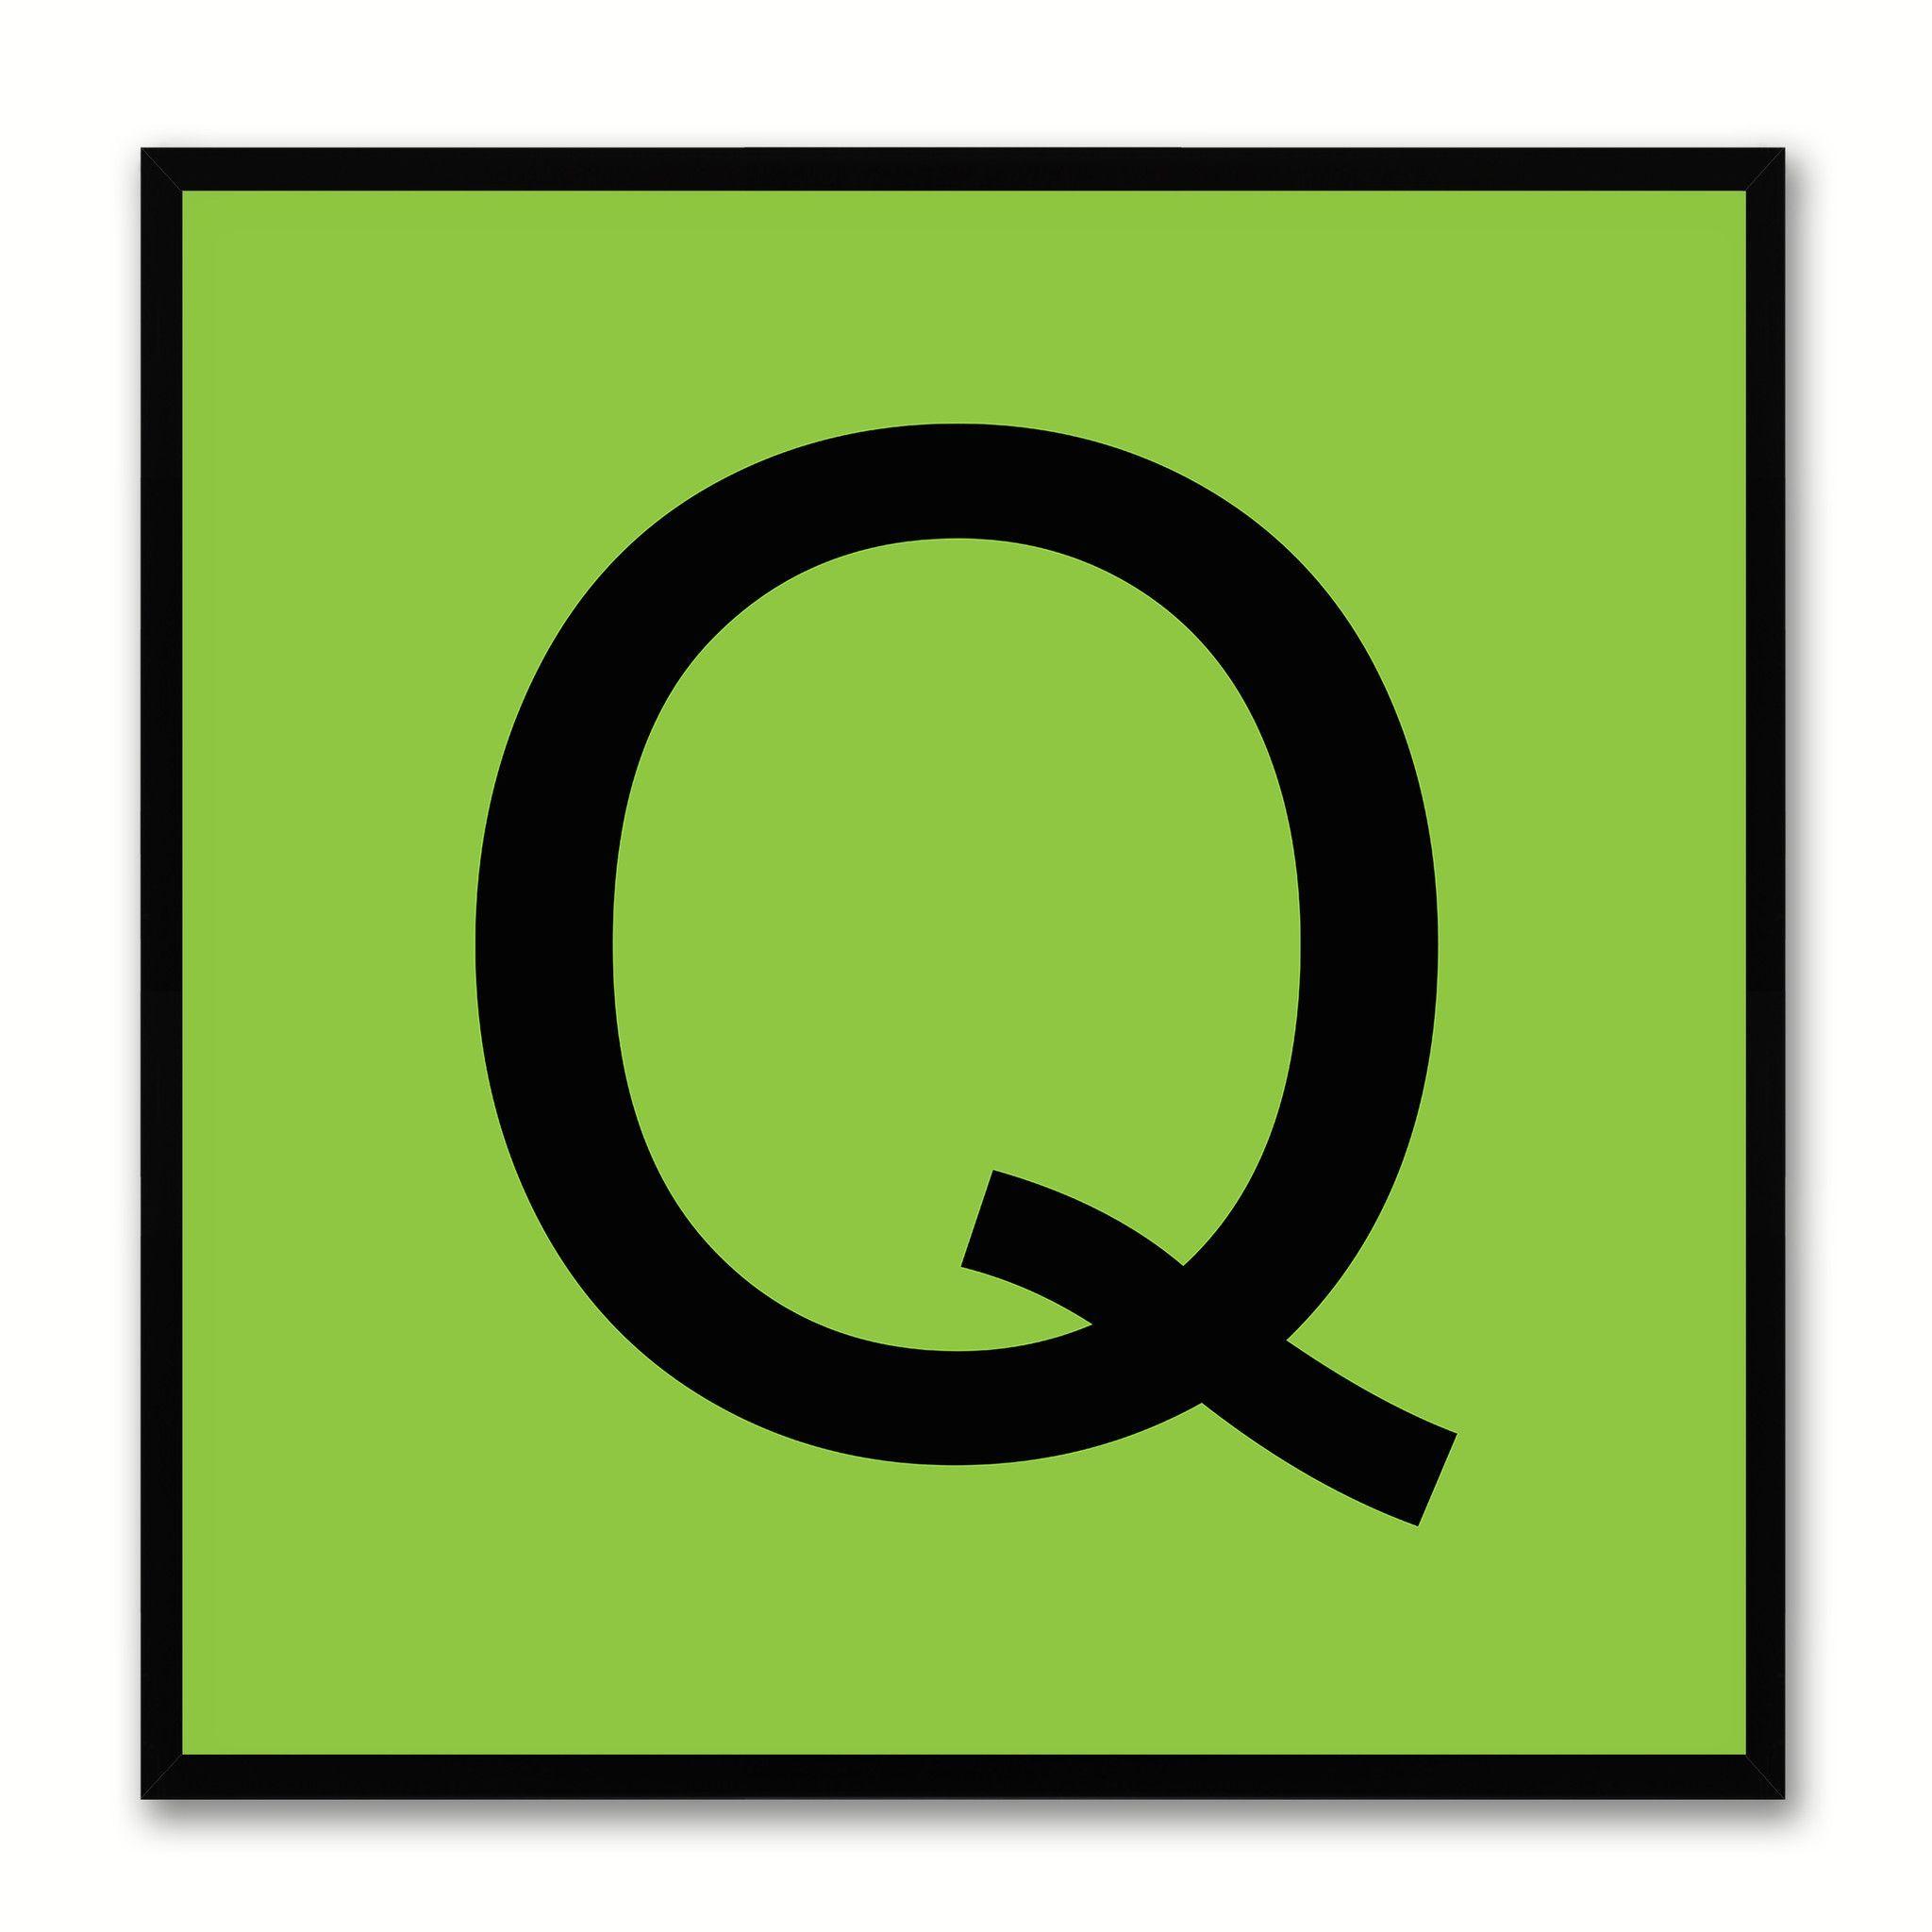 Alphabet Q Green Canvas Print Black Frame Kids Bedroom Wall Dcor Home Art